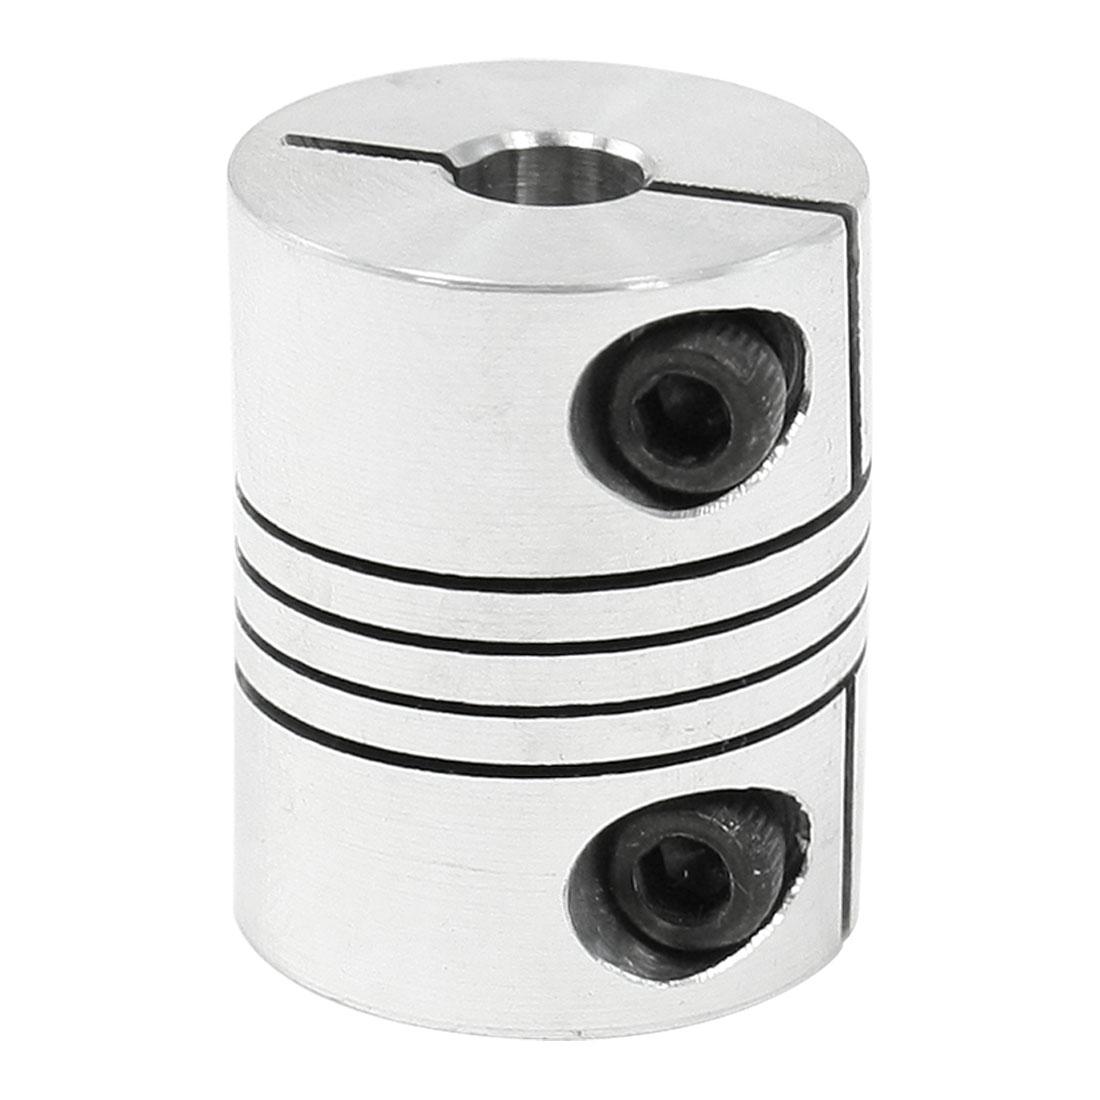 CNC Motor Shaft Coupler 6.35mm to 8mm Flexible Coupling 6.35x8mm